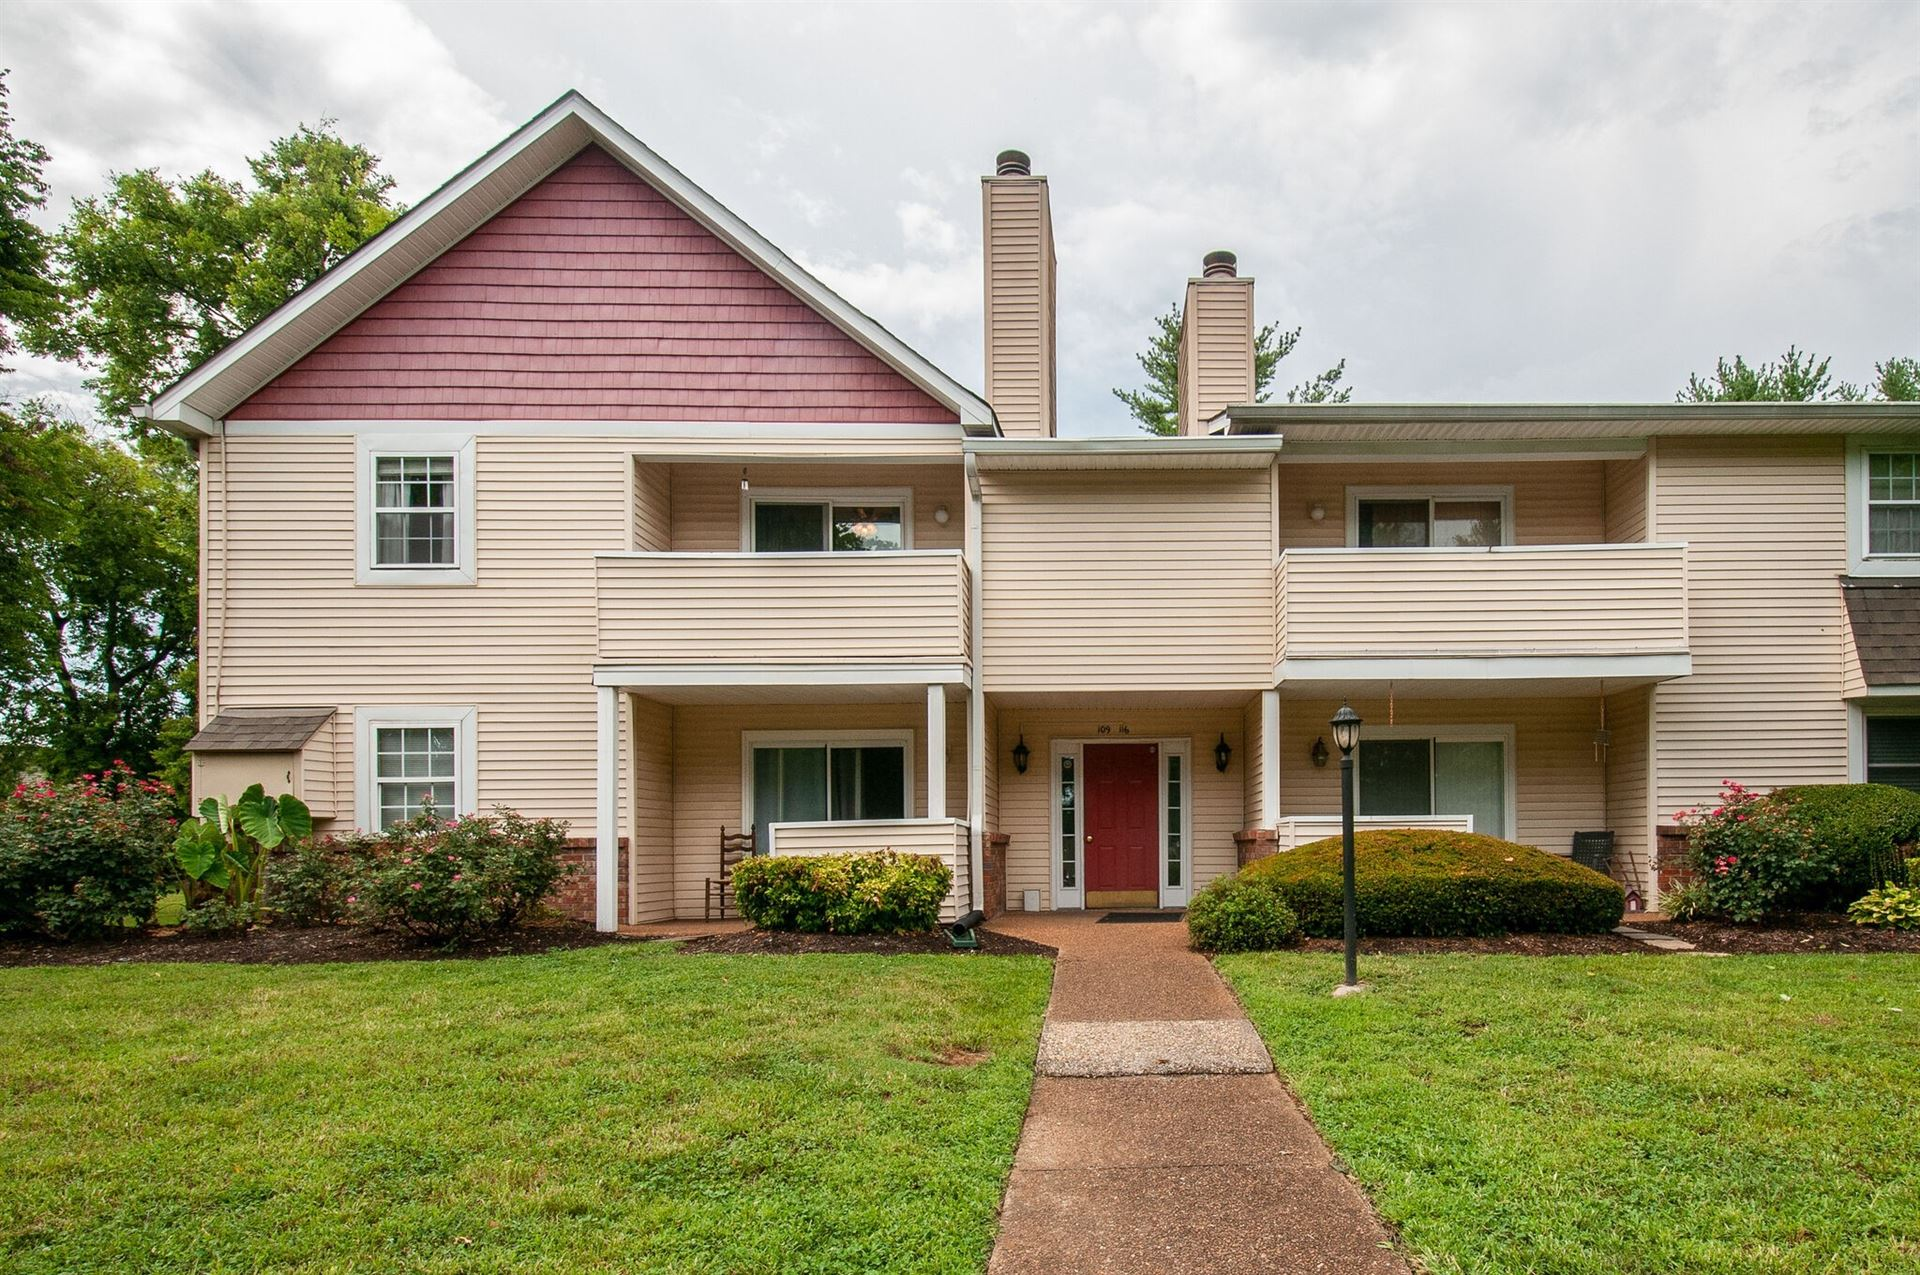 113 General Jackson Ln, Hermitage, TN 37076 - MLS#: 2191341